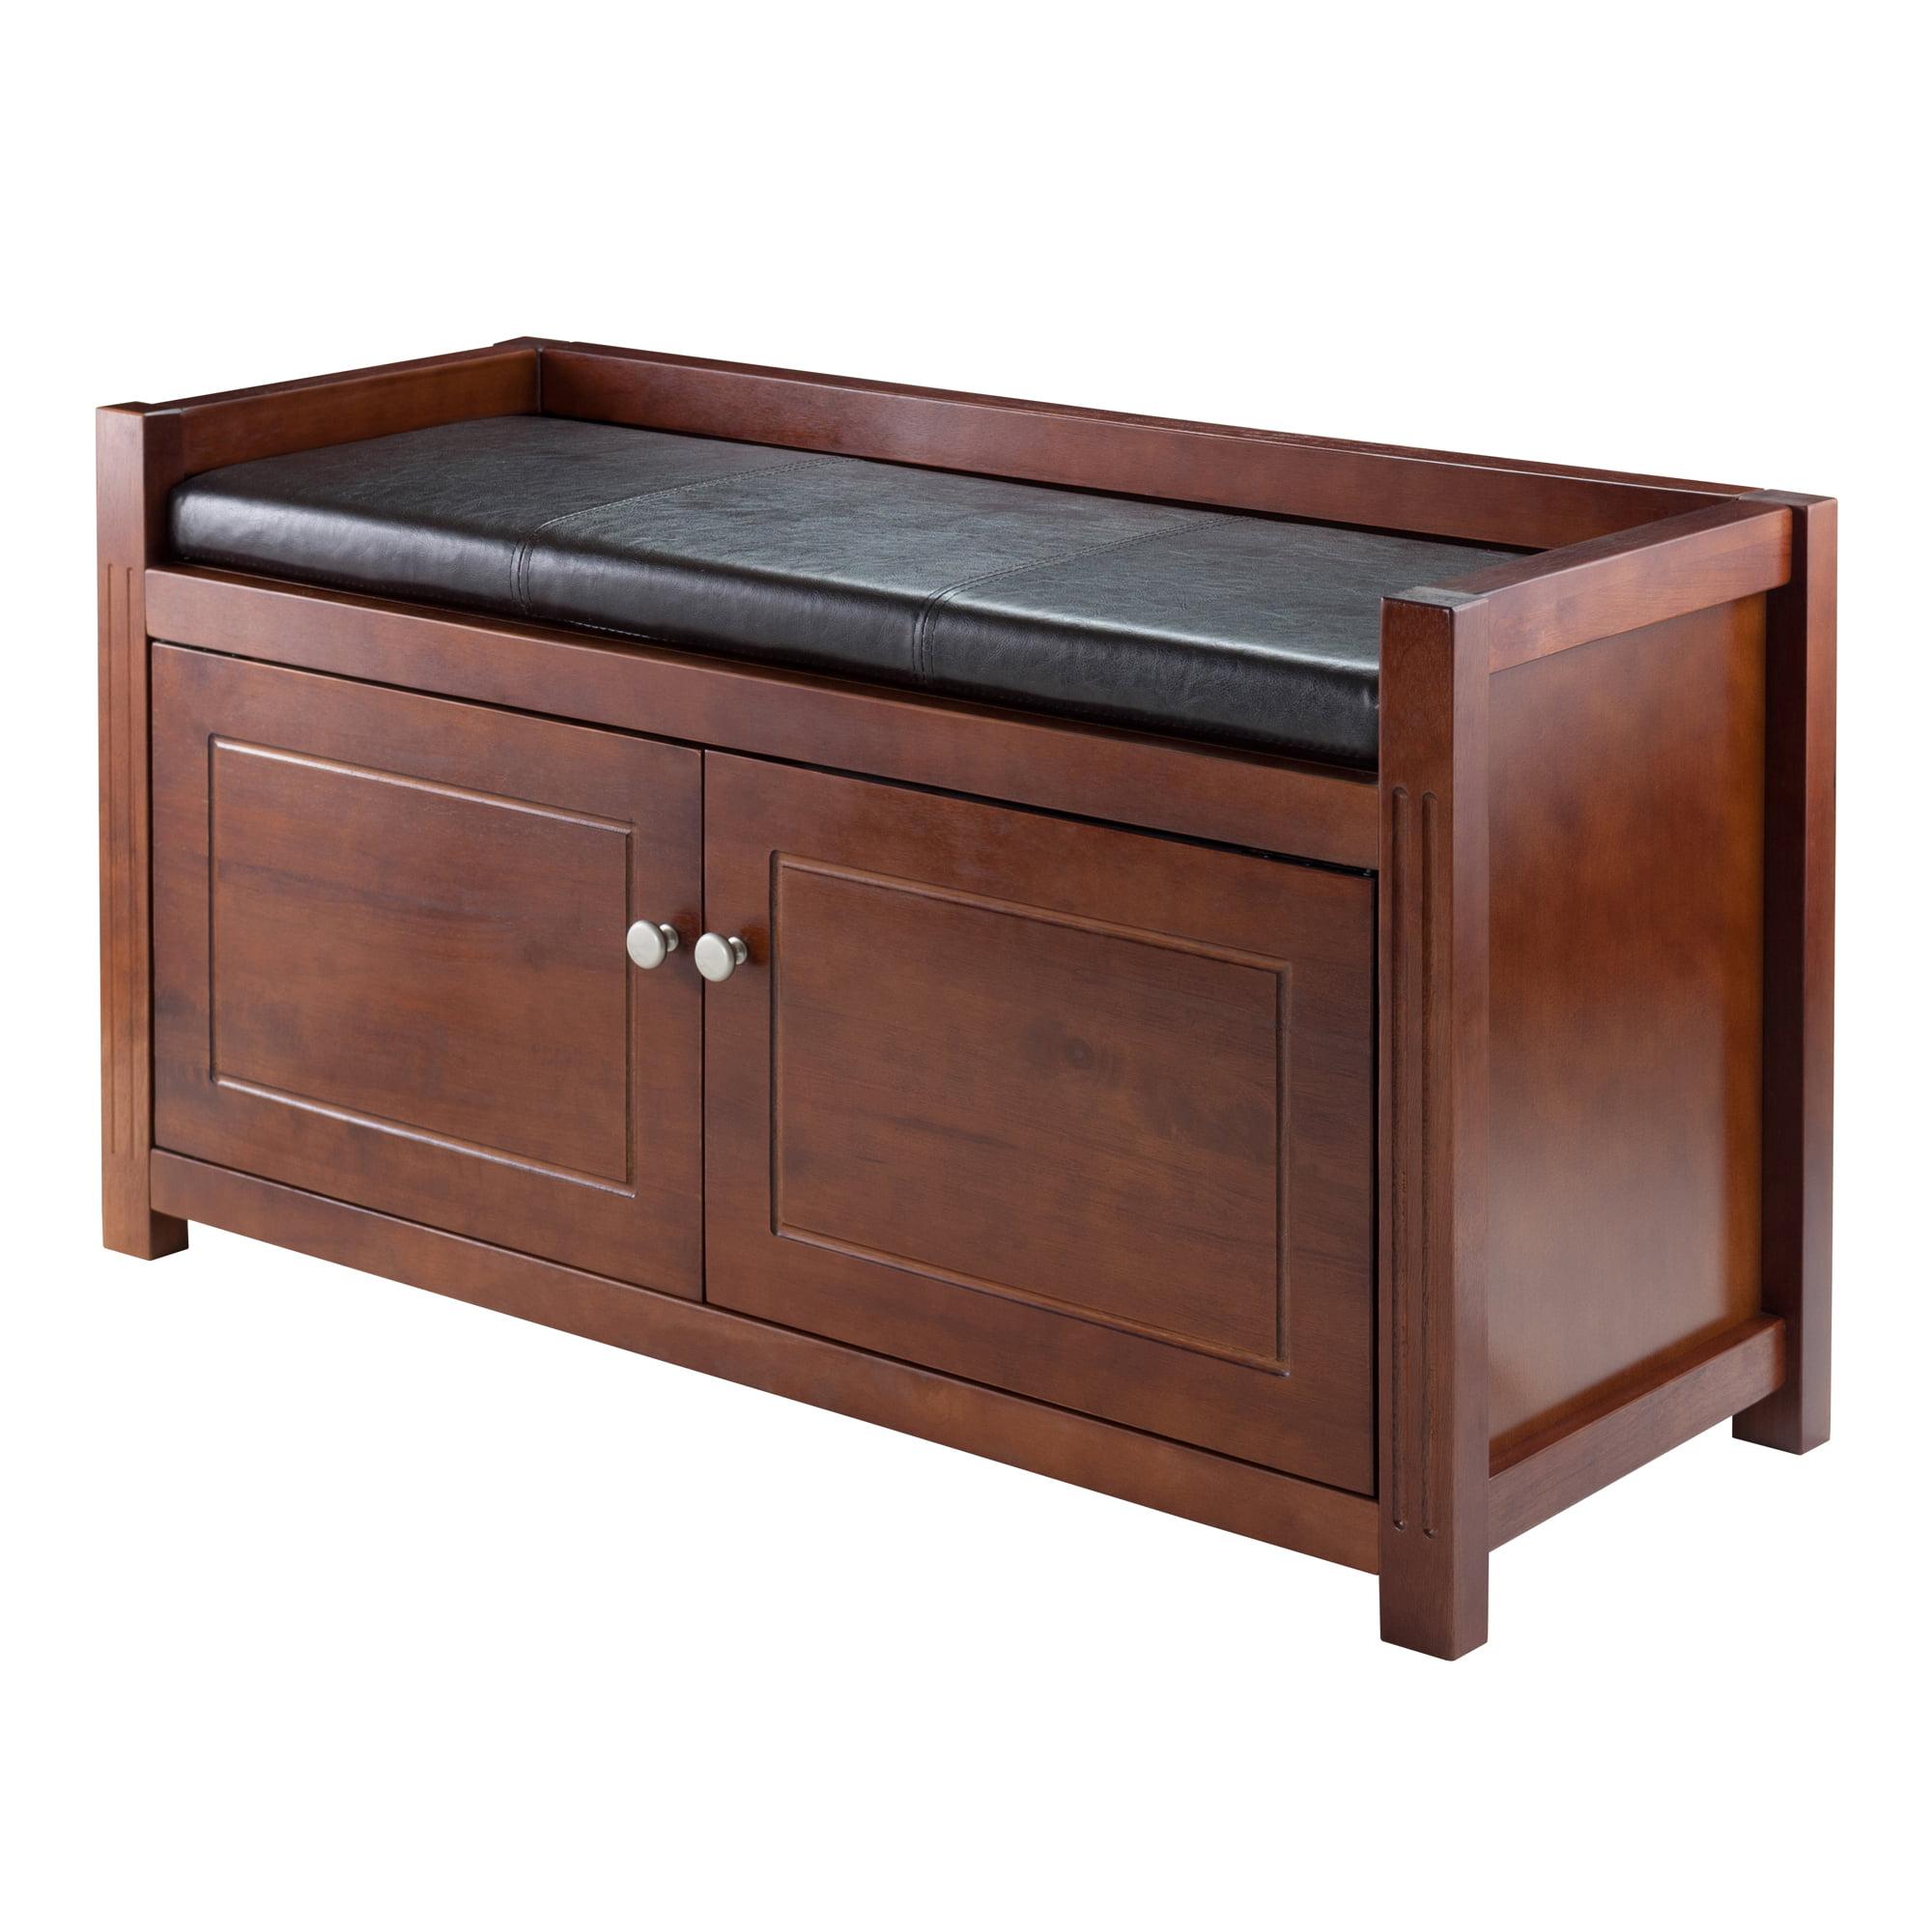 Winsome Wood Charleston 2pc Storage Bench Set w/ Cushion